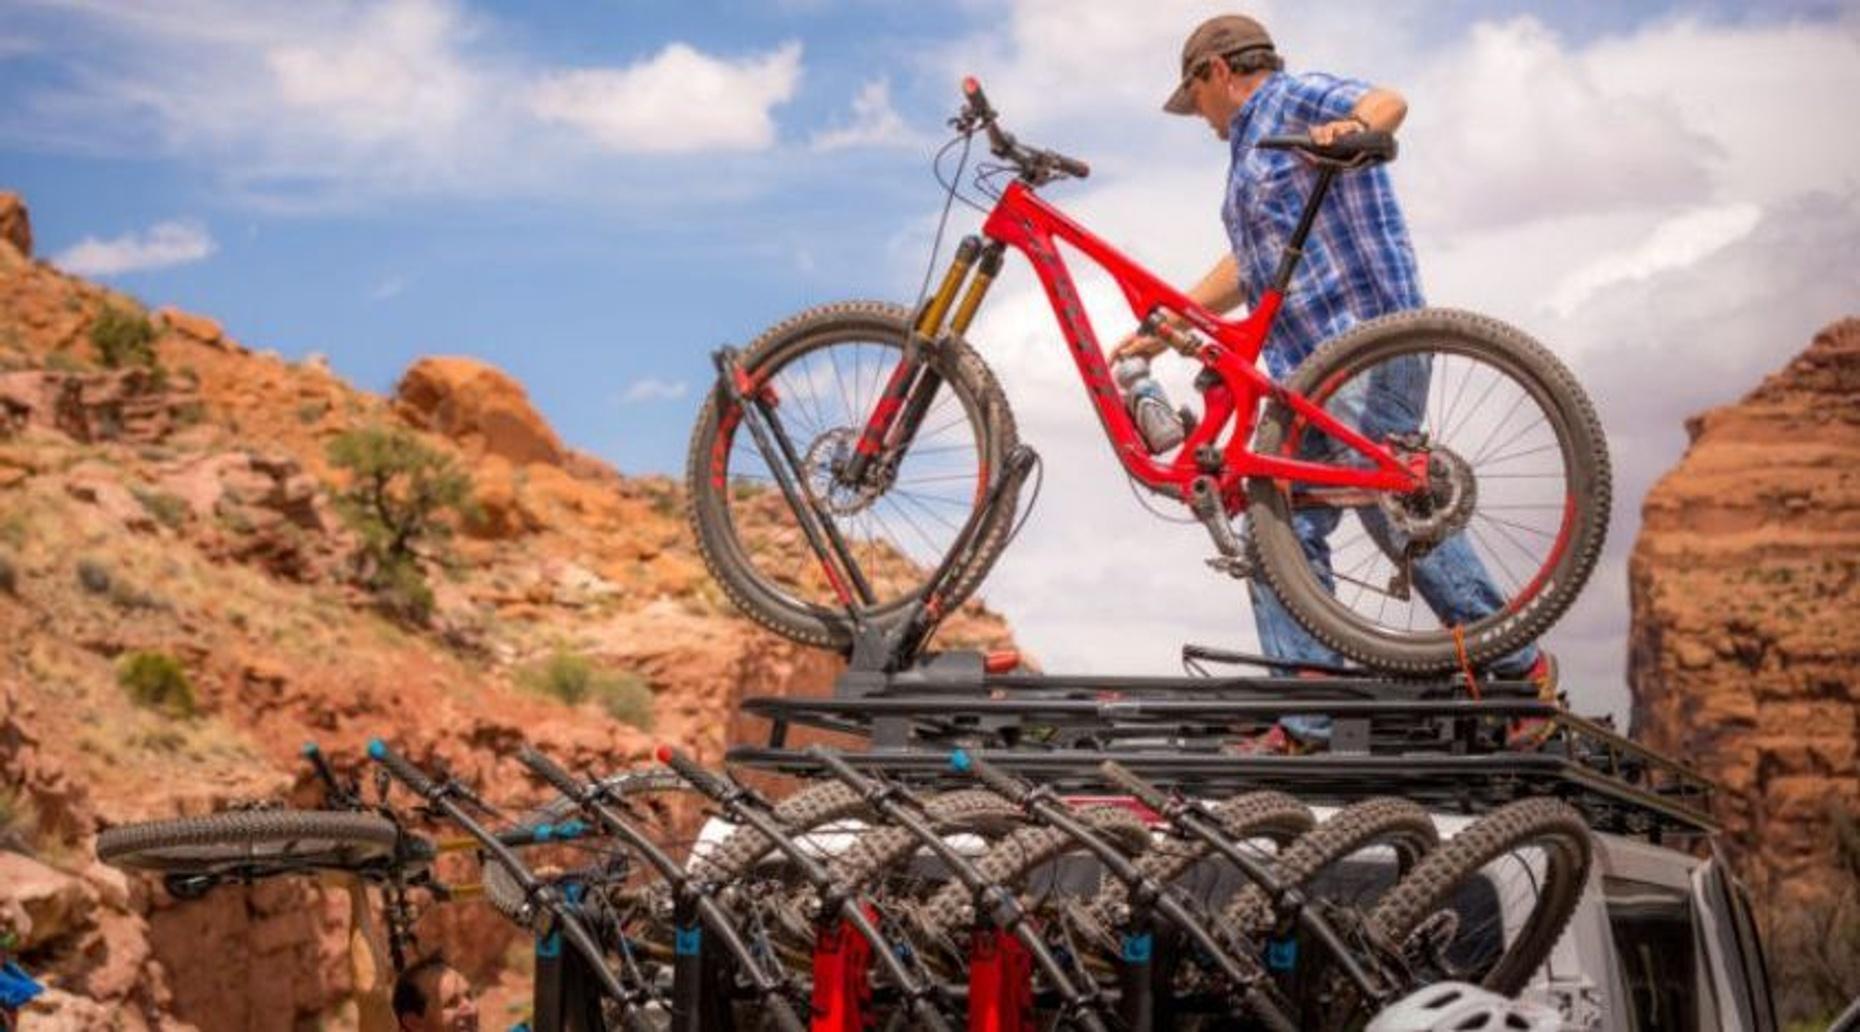 Shuttle to Porcupine Rim (& Above) Mountain Biking Trails